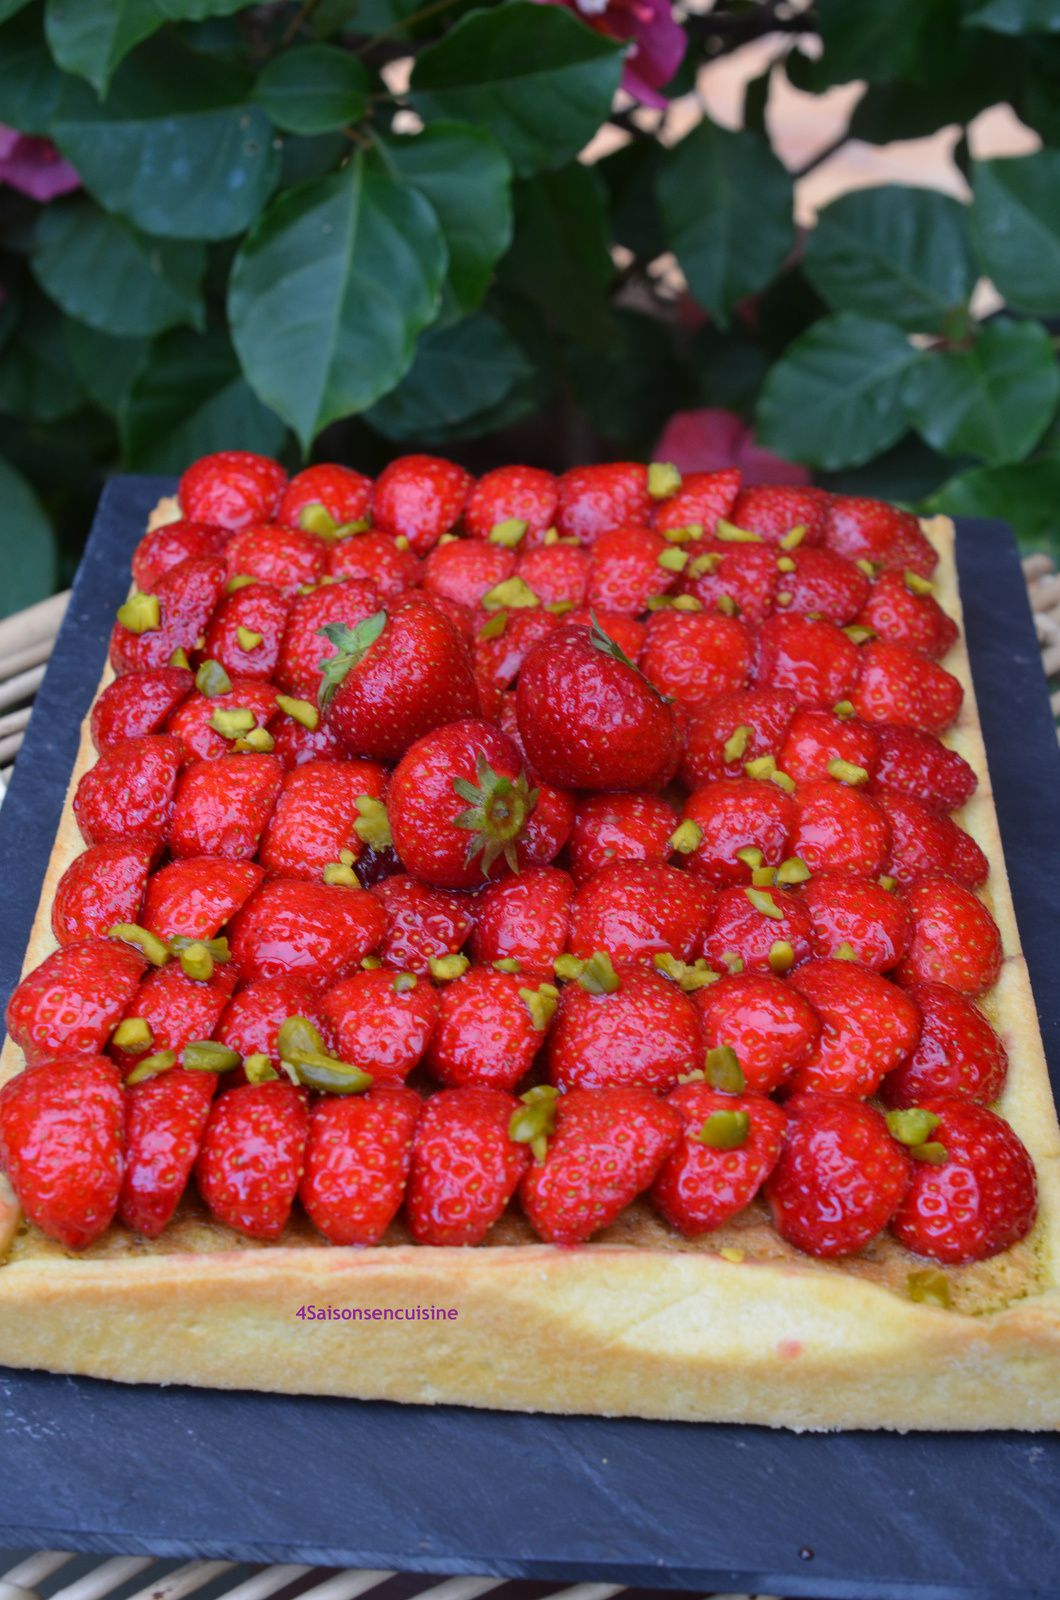 Tarte frangipane pistache aux fraises